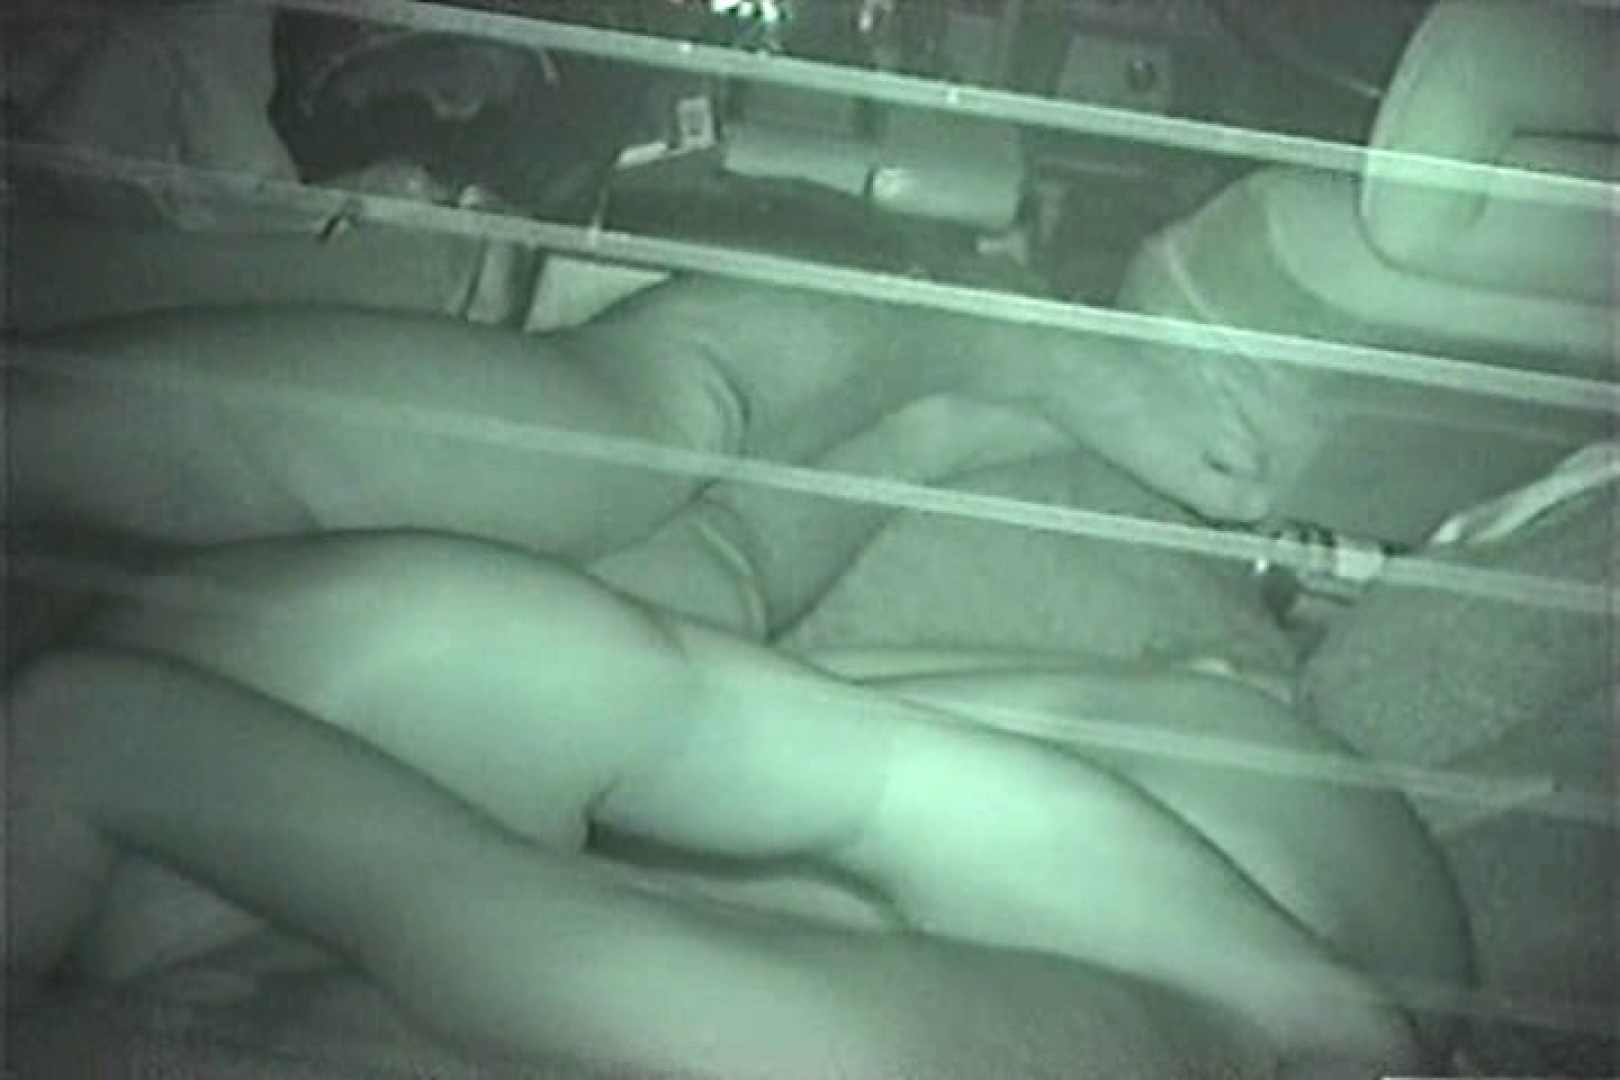 MASAさんの待ち伏せ撮り! 赤外線カーセックスVol.17 OLの実態 盗撮セックス無修正動画無料 89pic 2